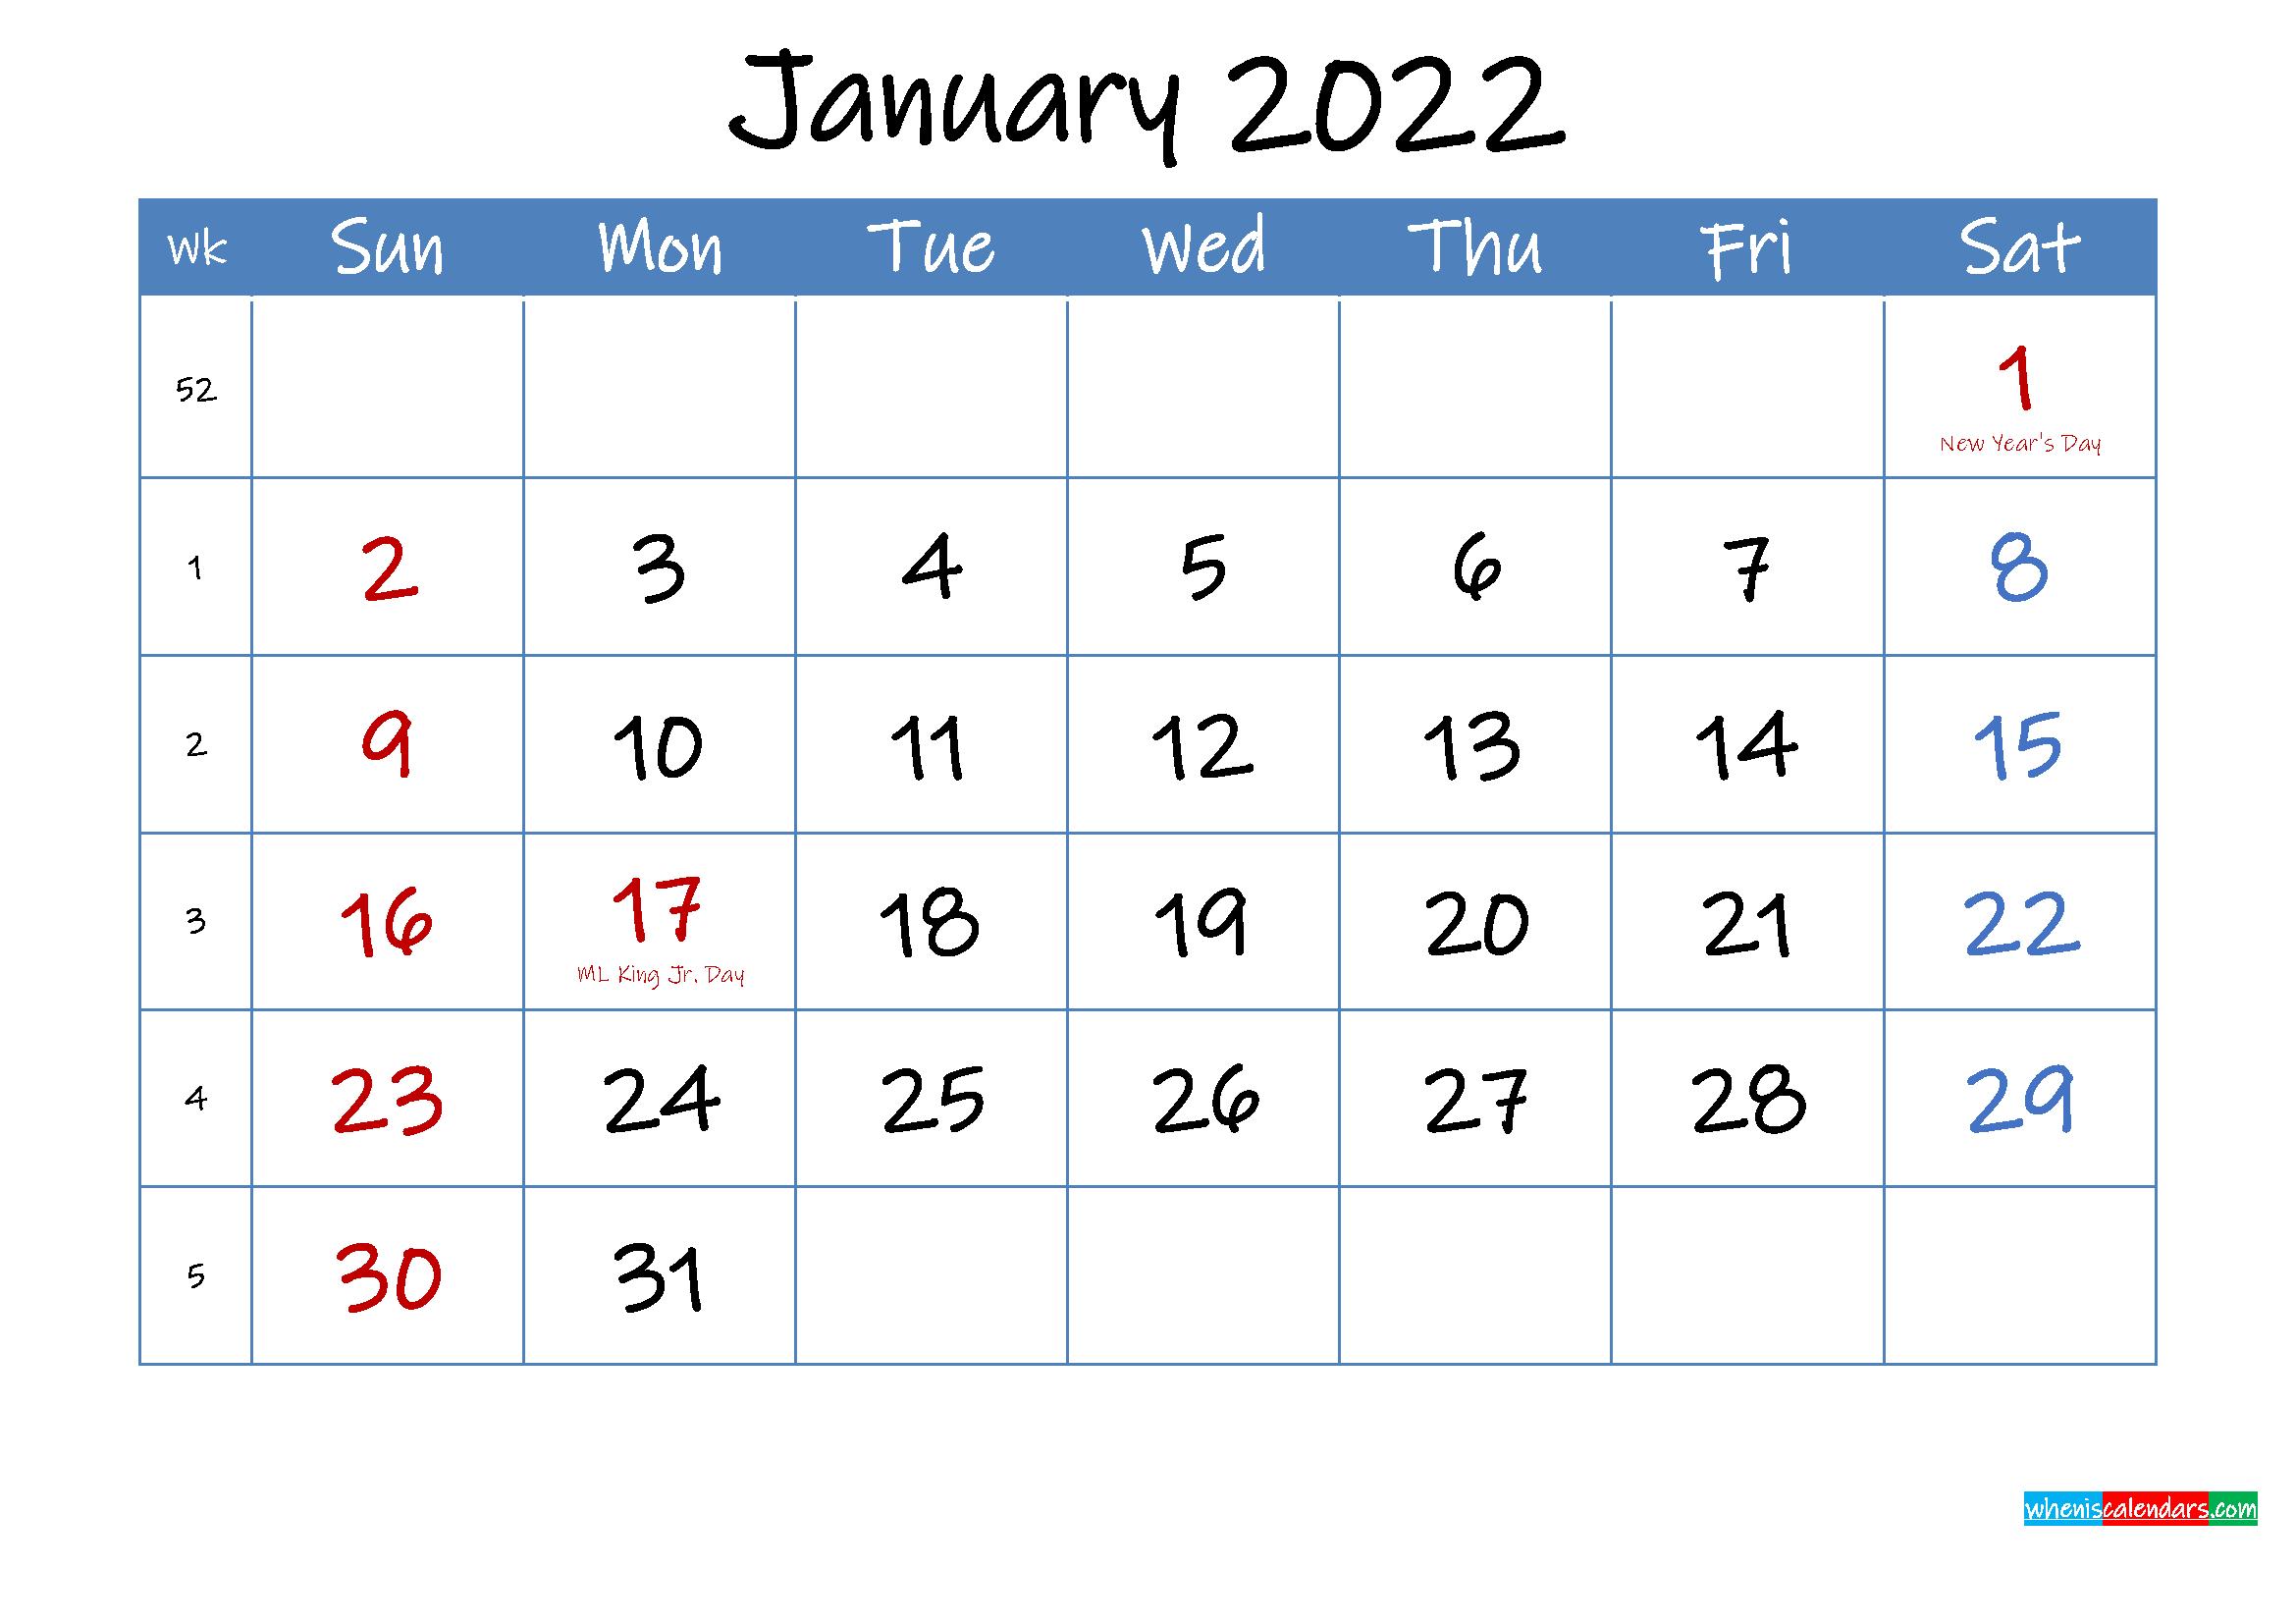 Printable January 2022 Calendar Word - Template Ink22M13 In Calendar Of January 2022